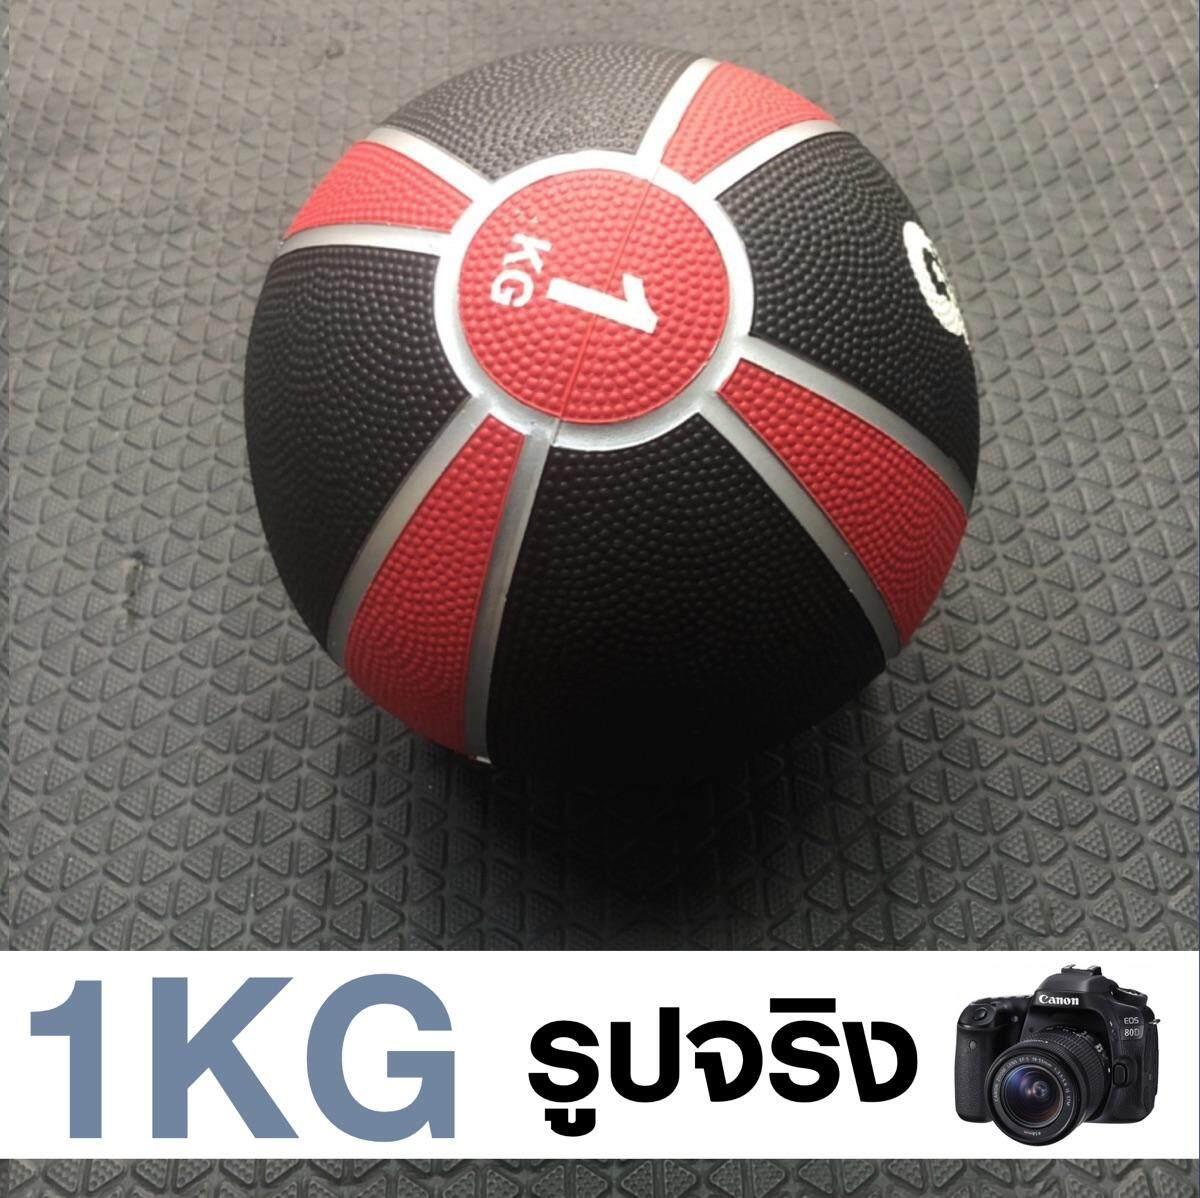 Medicine Ball เมดิซินบอล ลูกบอลน้ำหนัก 1 Kg (red) By Zoo Fitness.